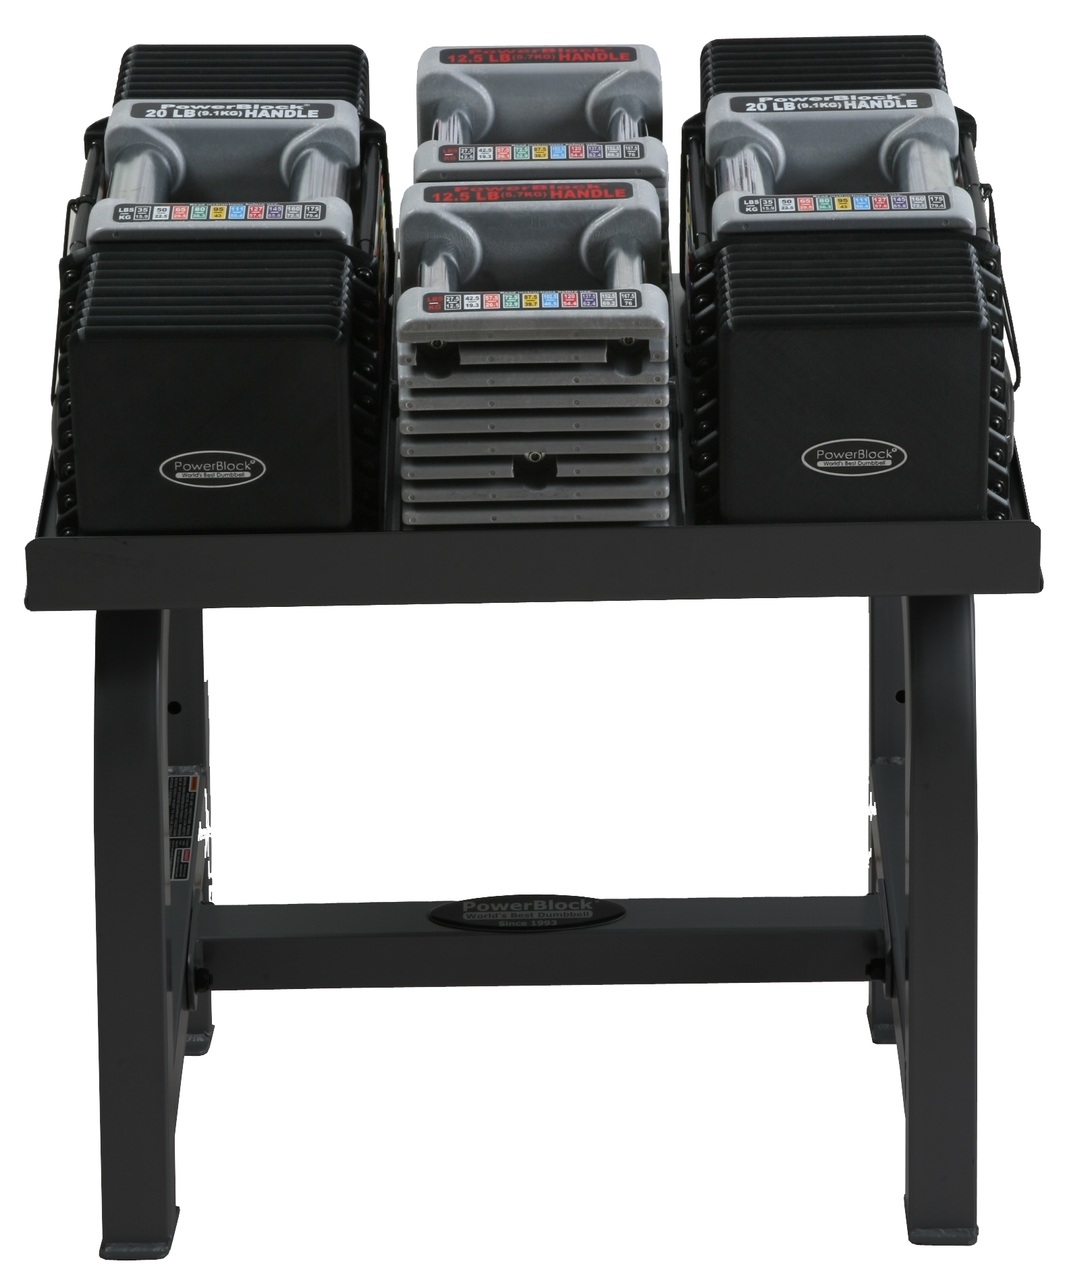 PowerBlock Pro 125 Commercial Set